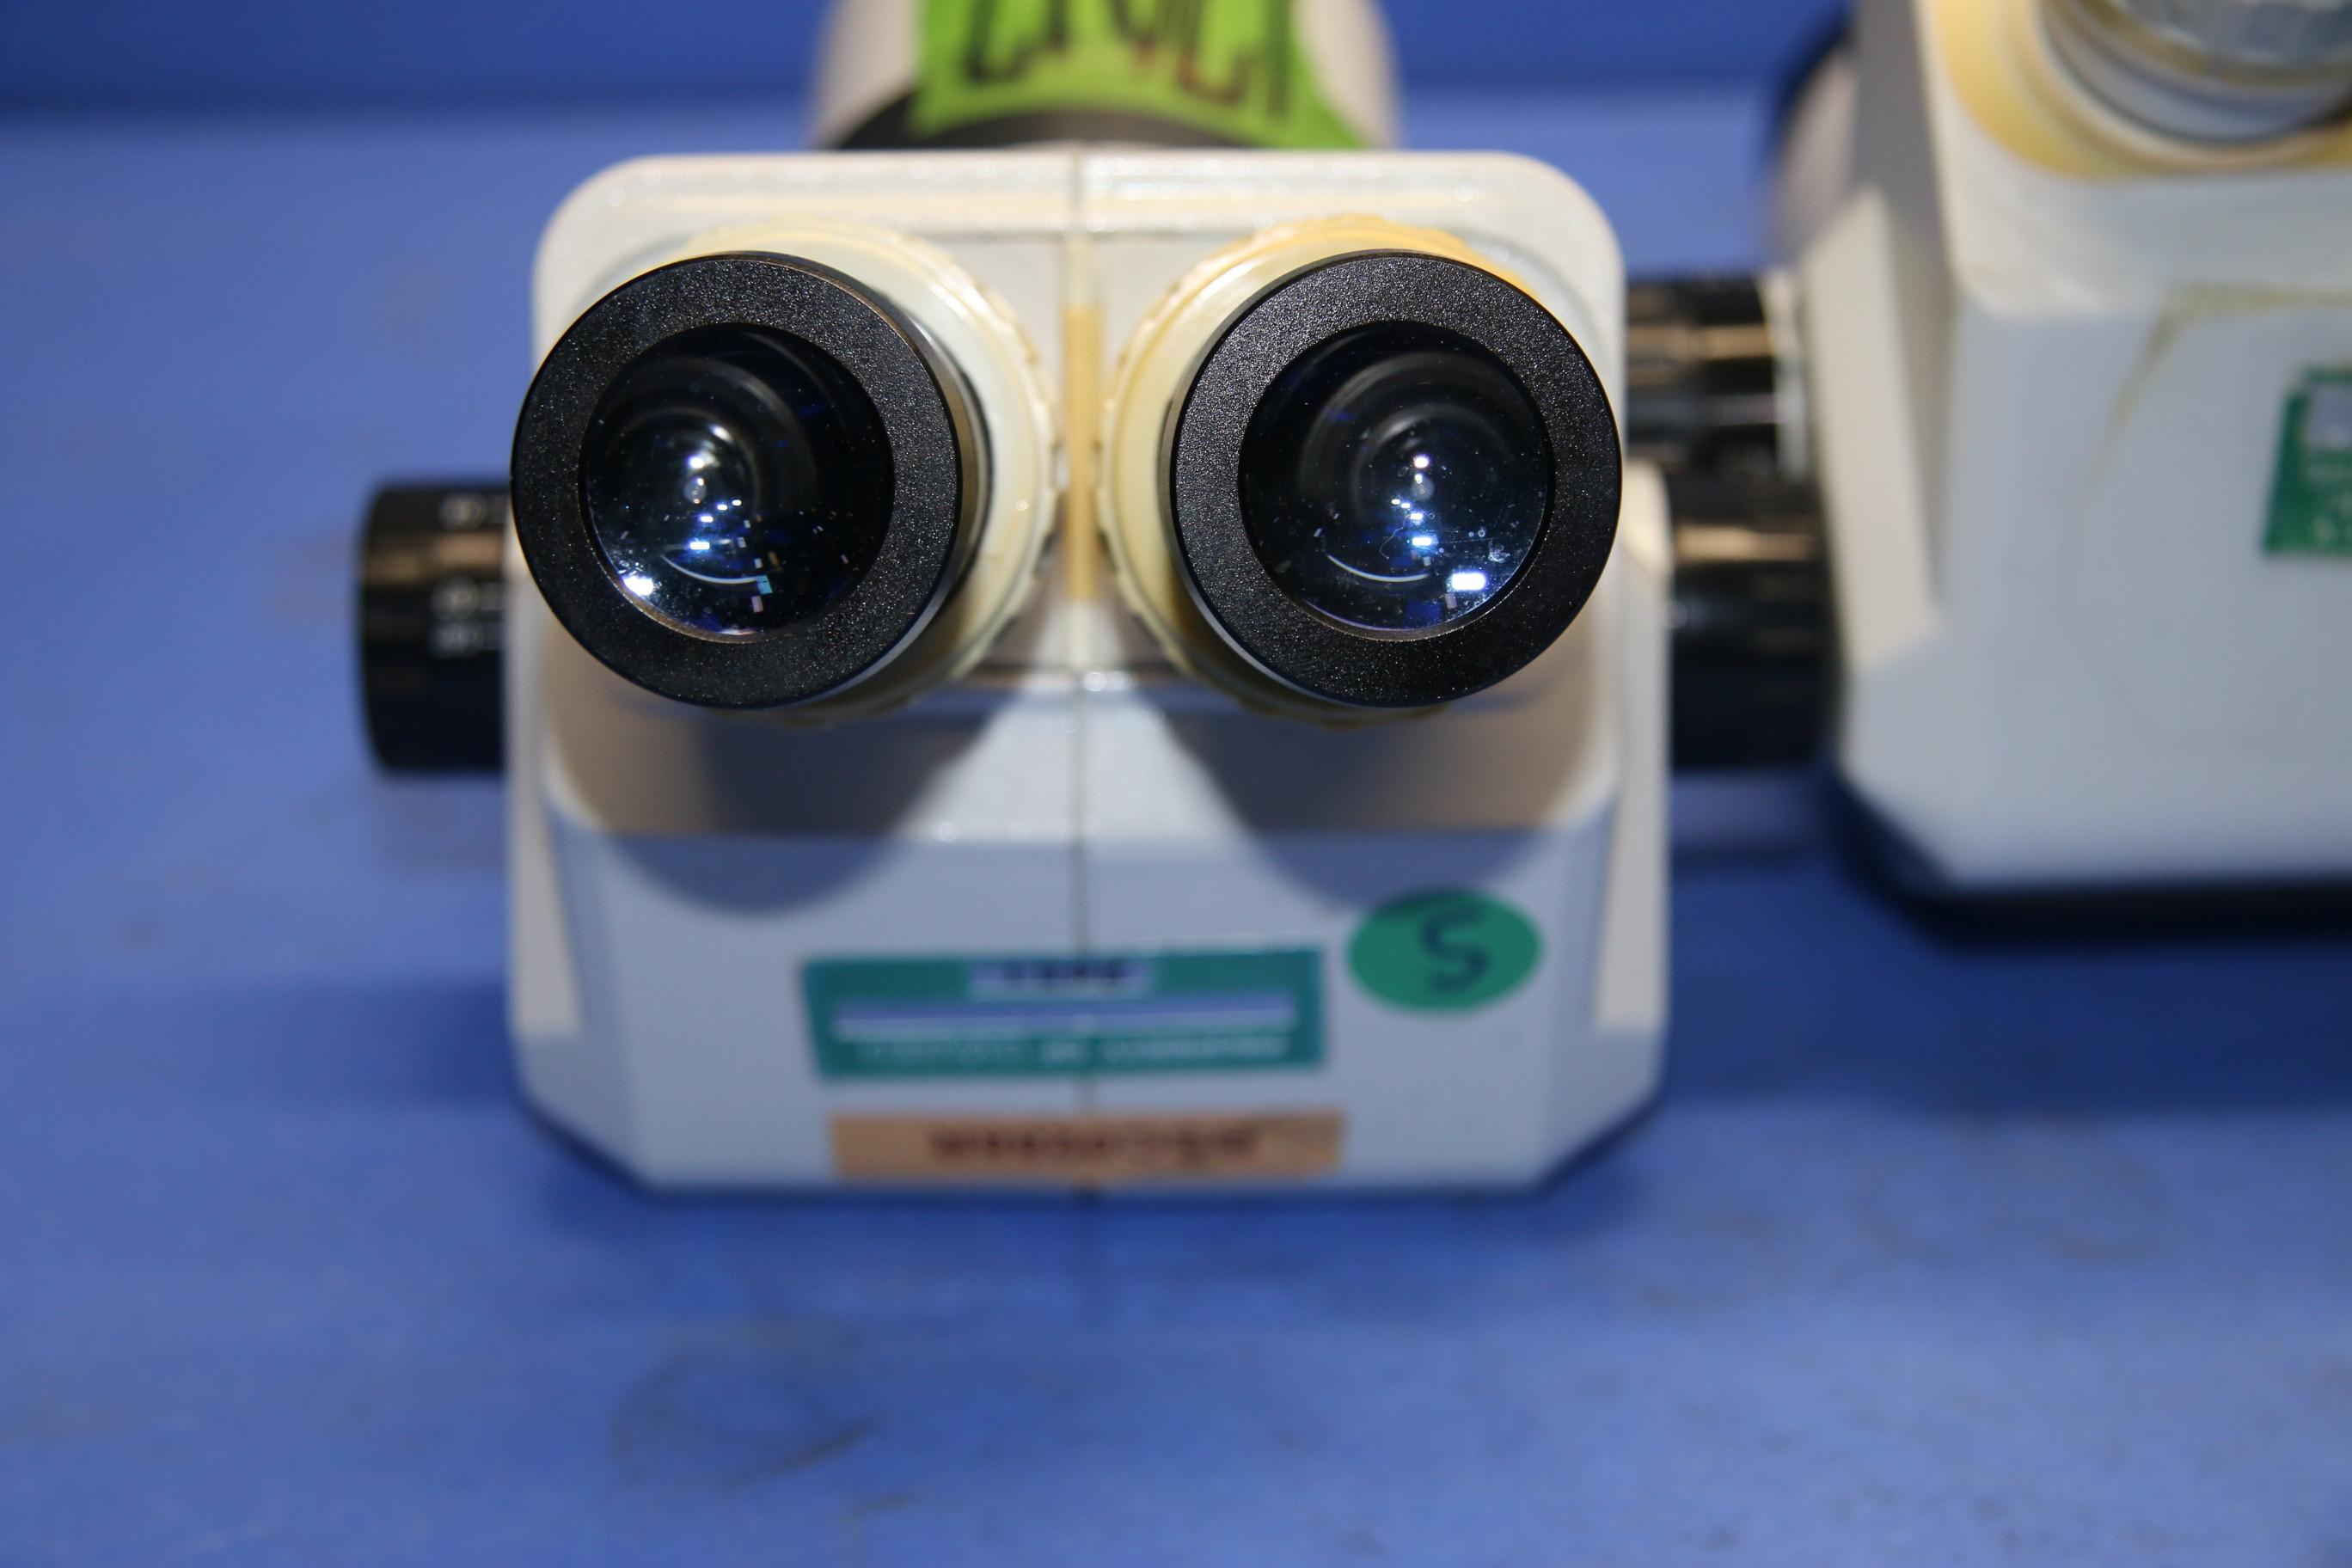 (2) Used Stereo Zoom SZ201101 Binocular Body Microscope 17017